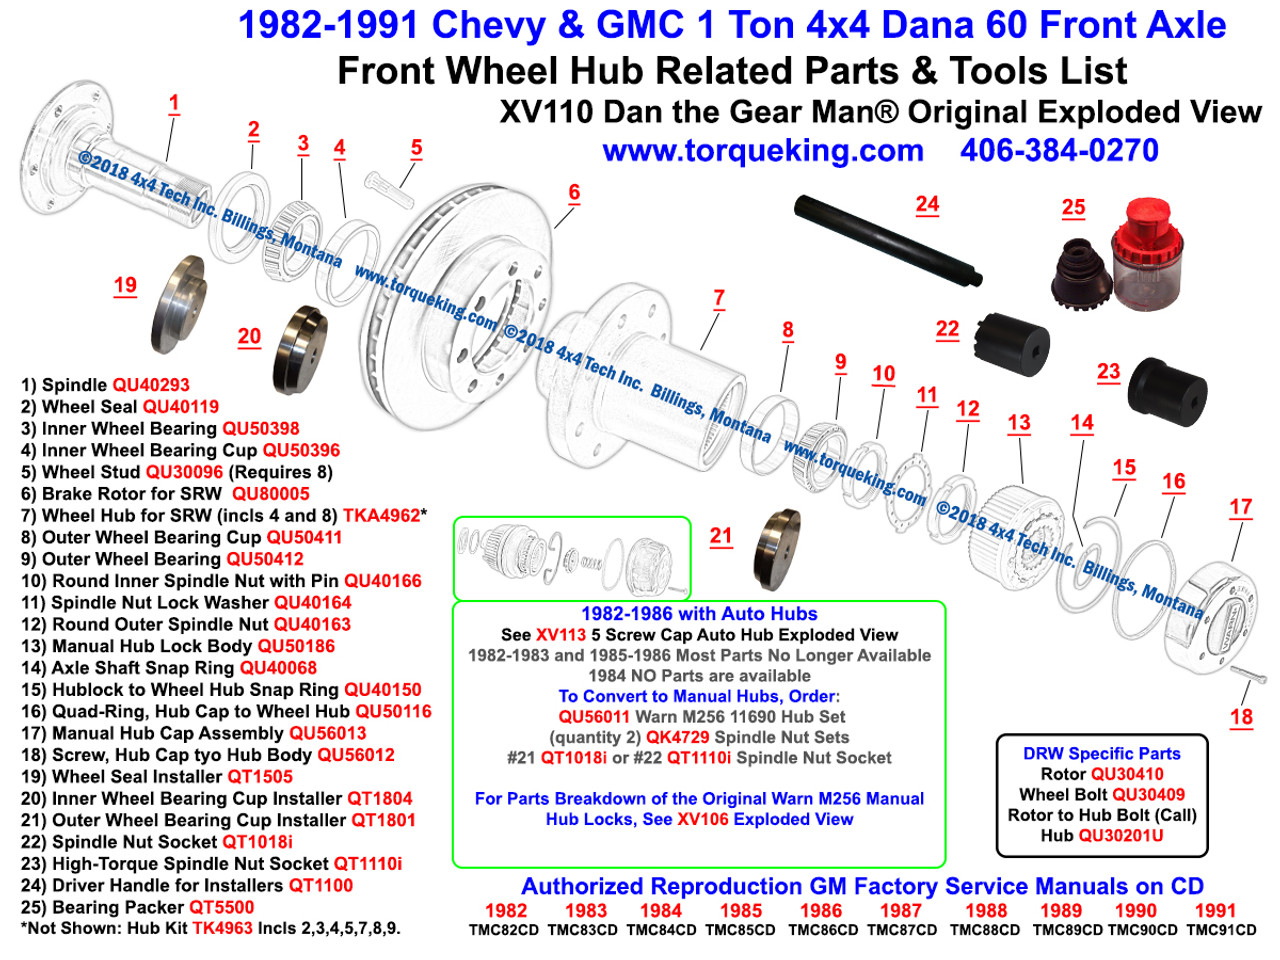 Qu40150 Dana 50 60 Hub Body To Wheel Retaining Ring. Dana 60 19821991 Chevygmc 1 Ton 4x4 Front Hub Exploded View. Ford. Ford 1 Ton Dana 80 Diagram At Scoala.co